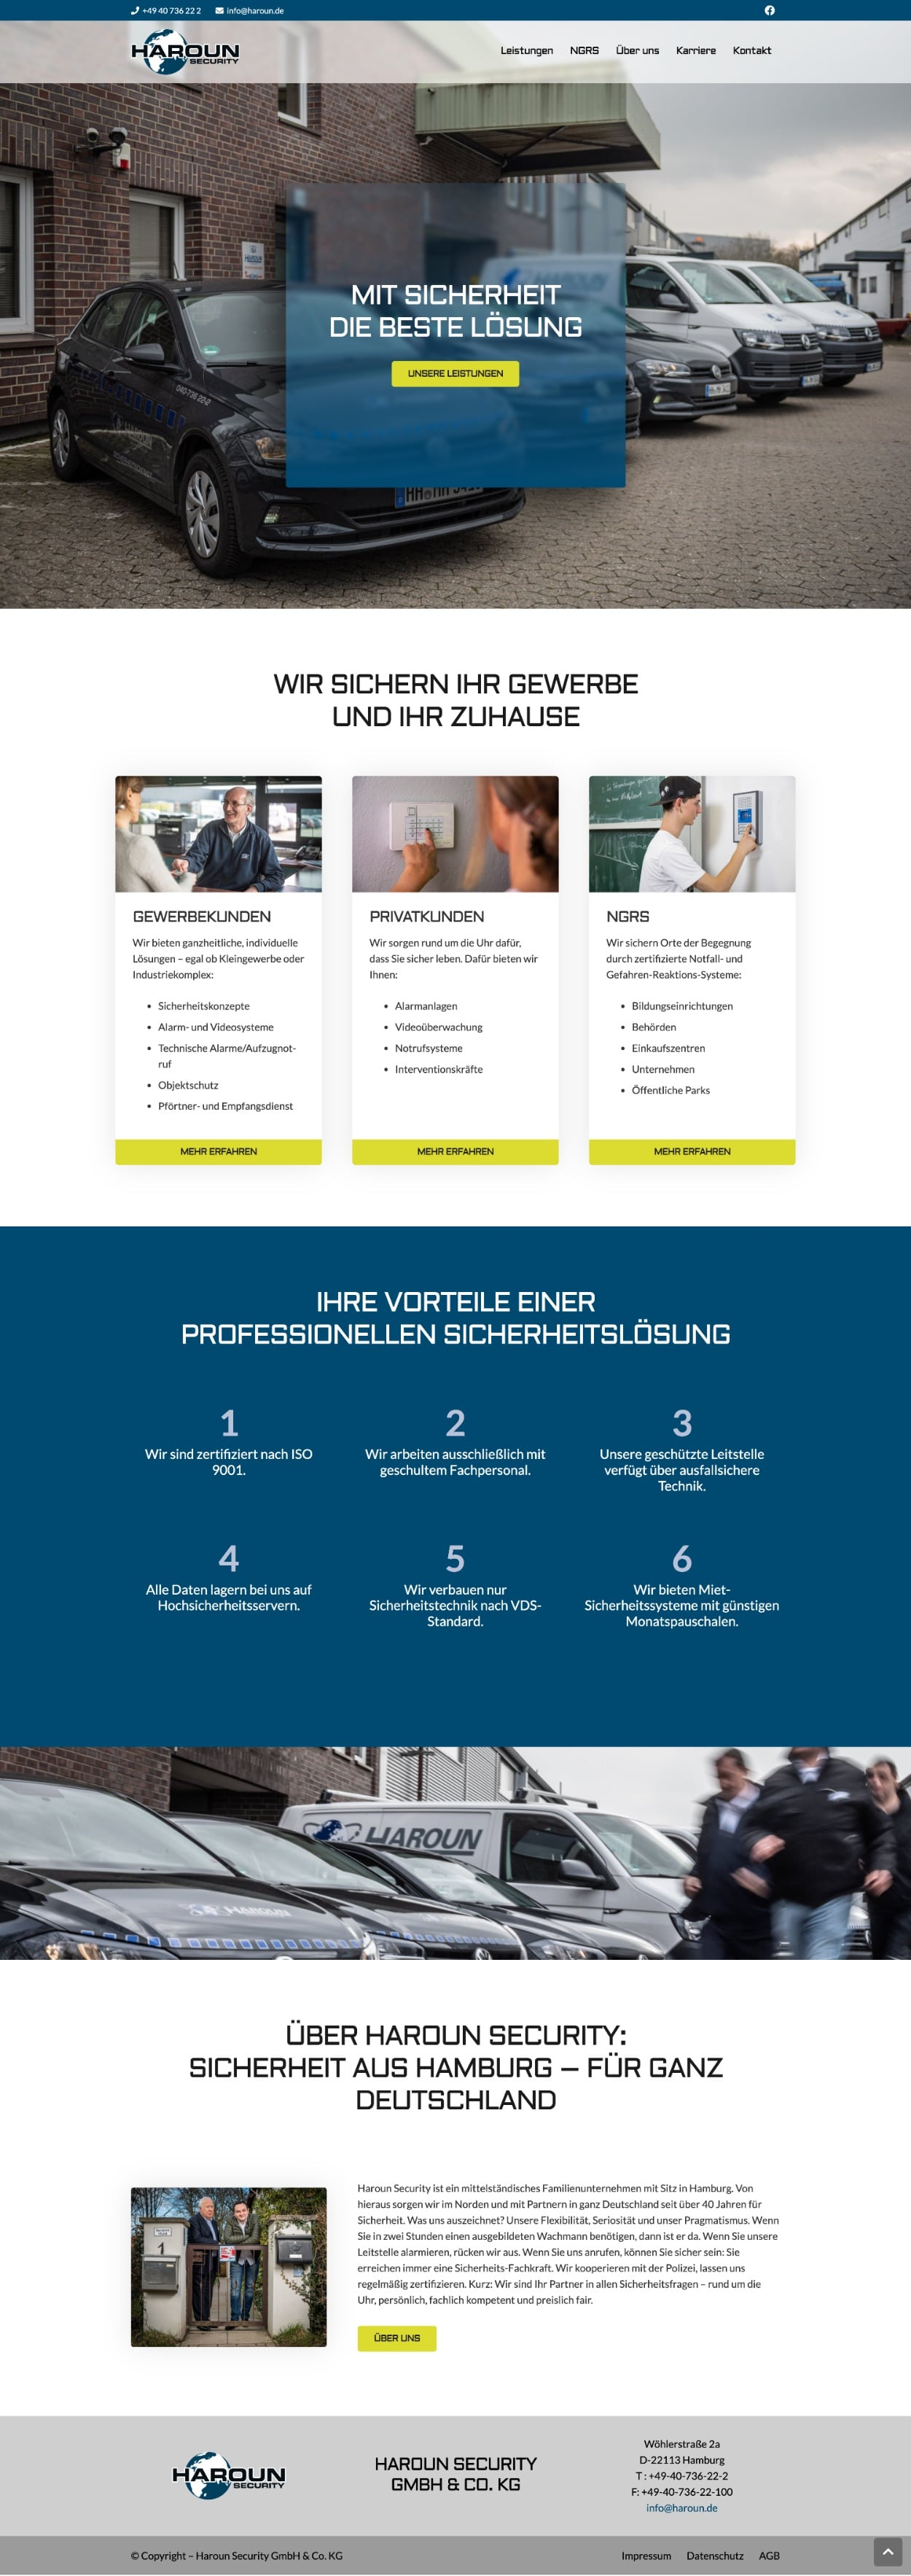 Haroun Security GmbH & Co. KG - Website